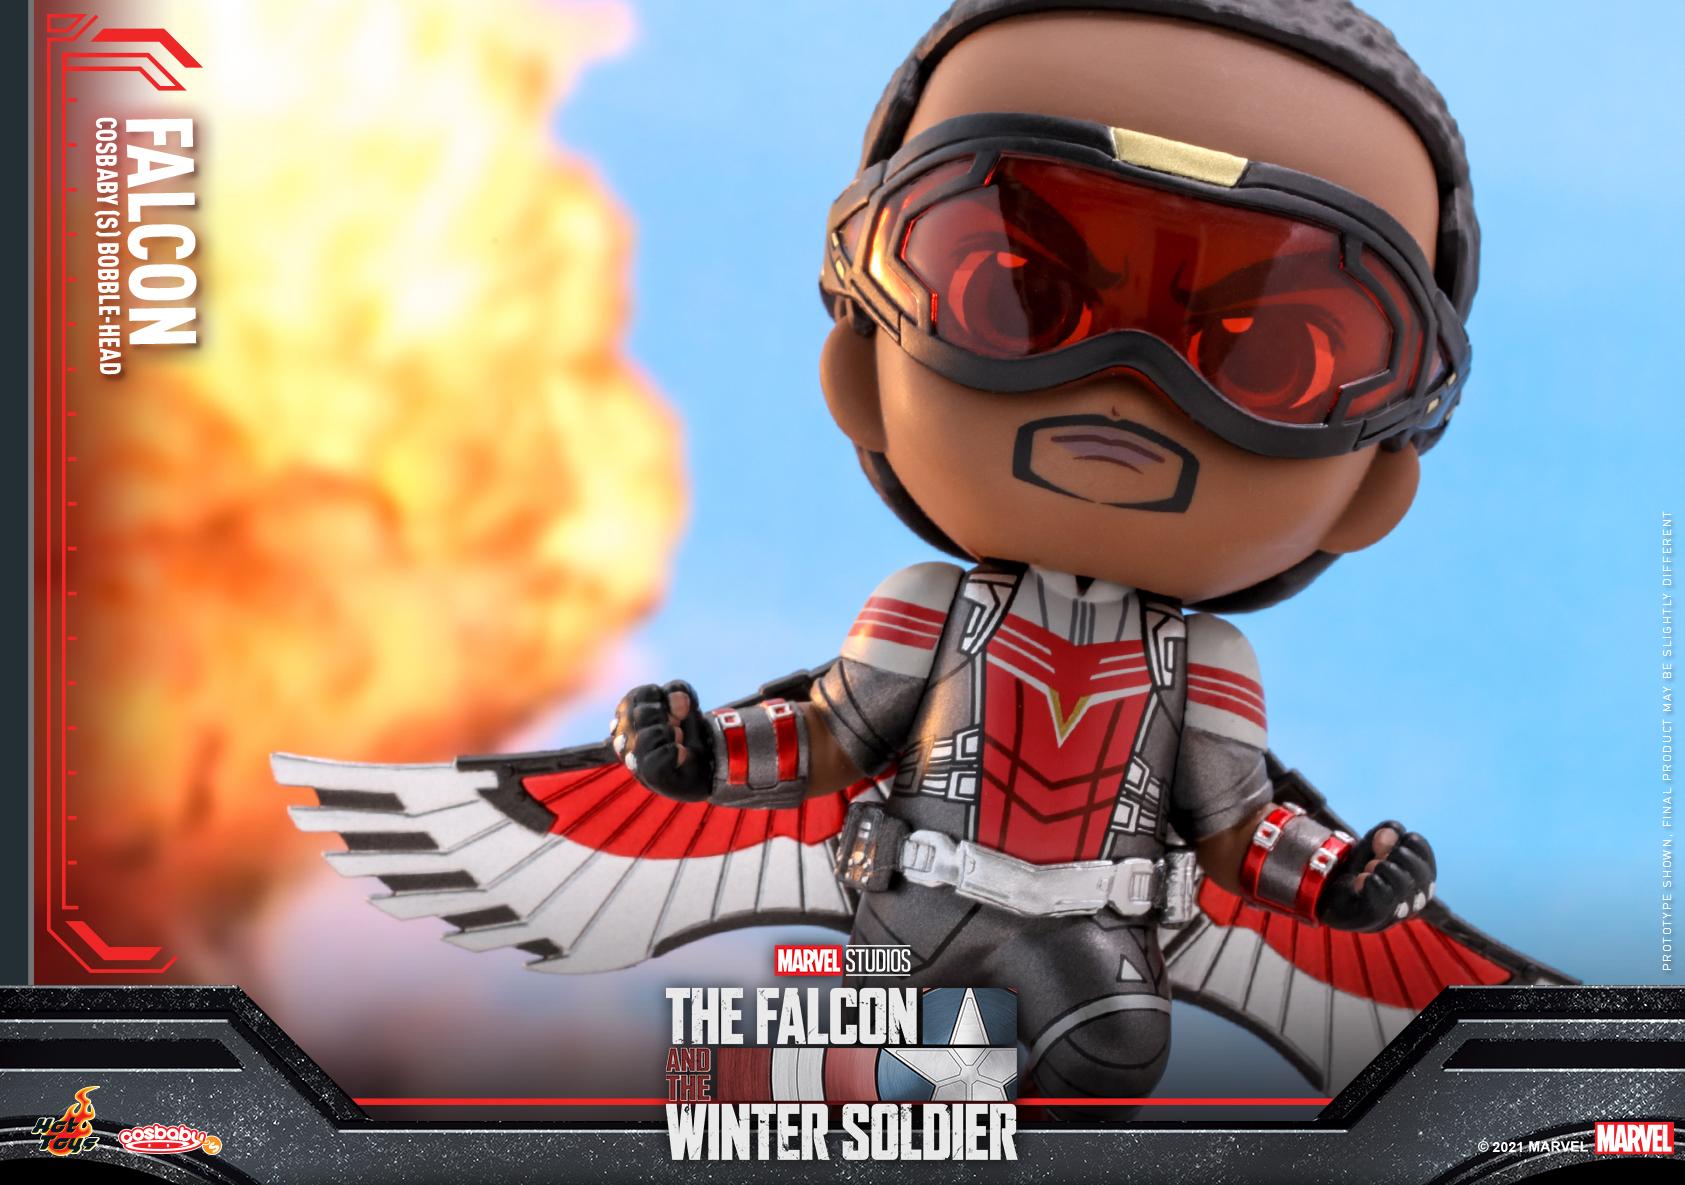 Hot Toys - Falcon and Winter Soldier - Falcon Cosbaby_PR3